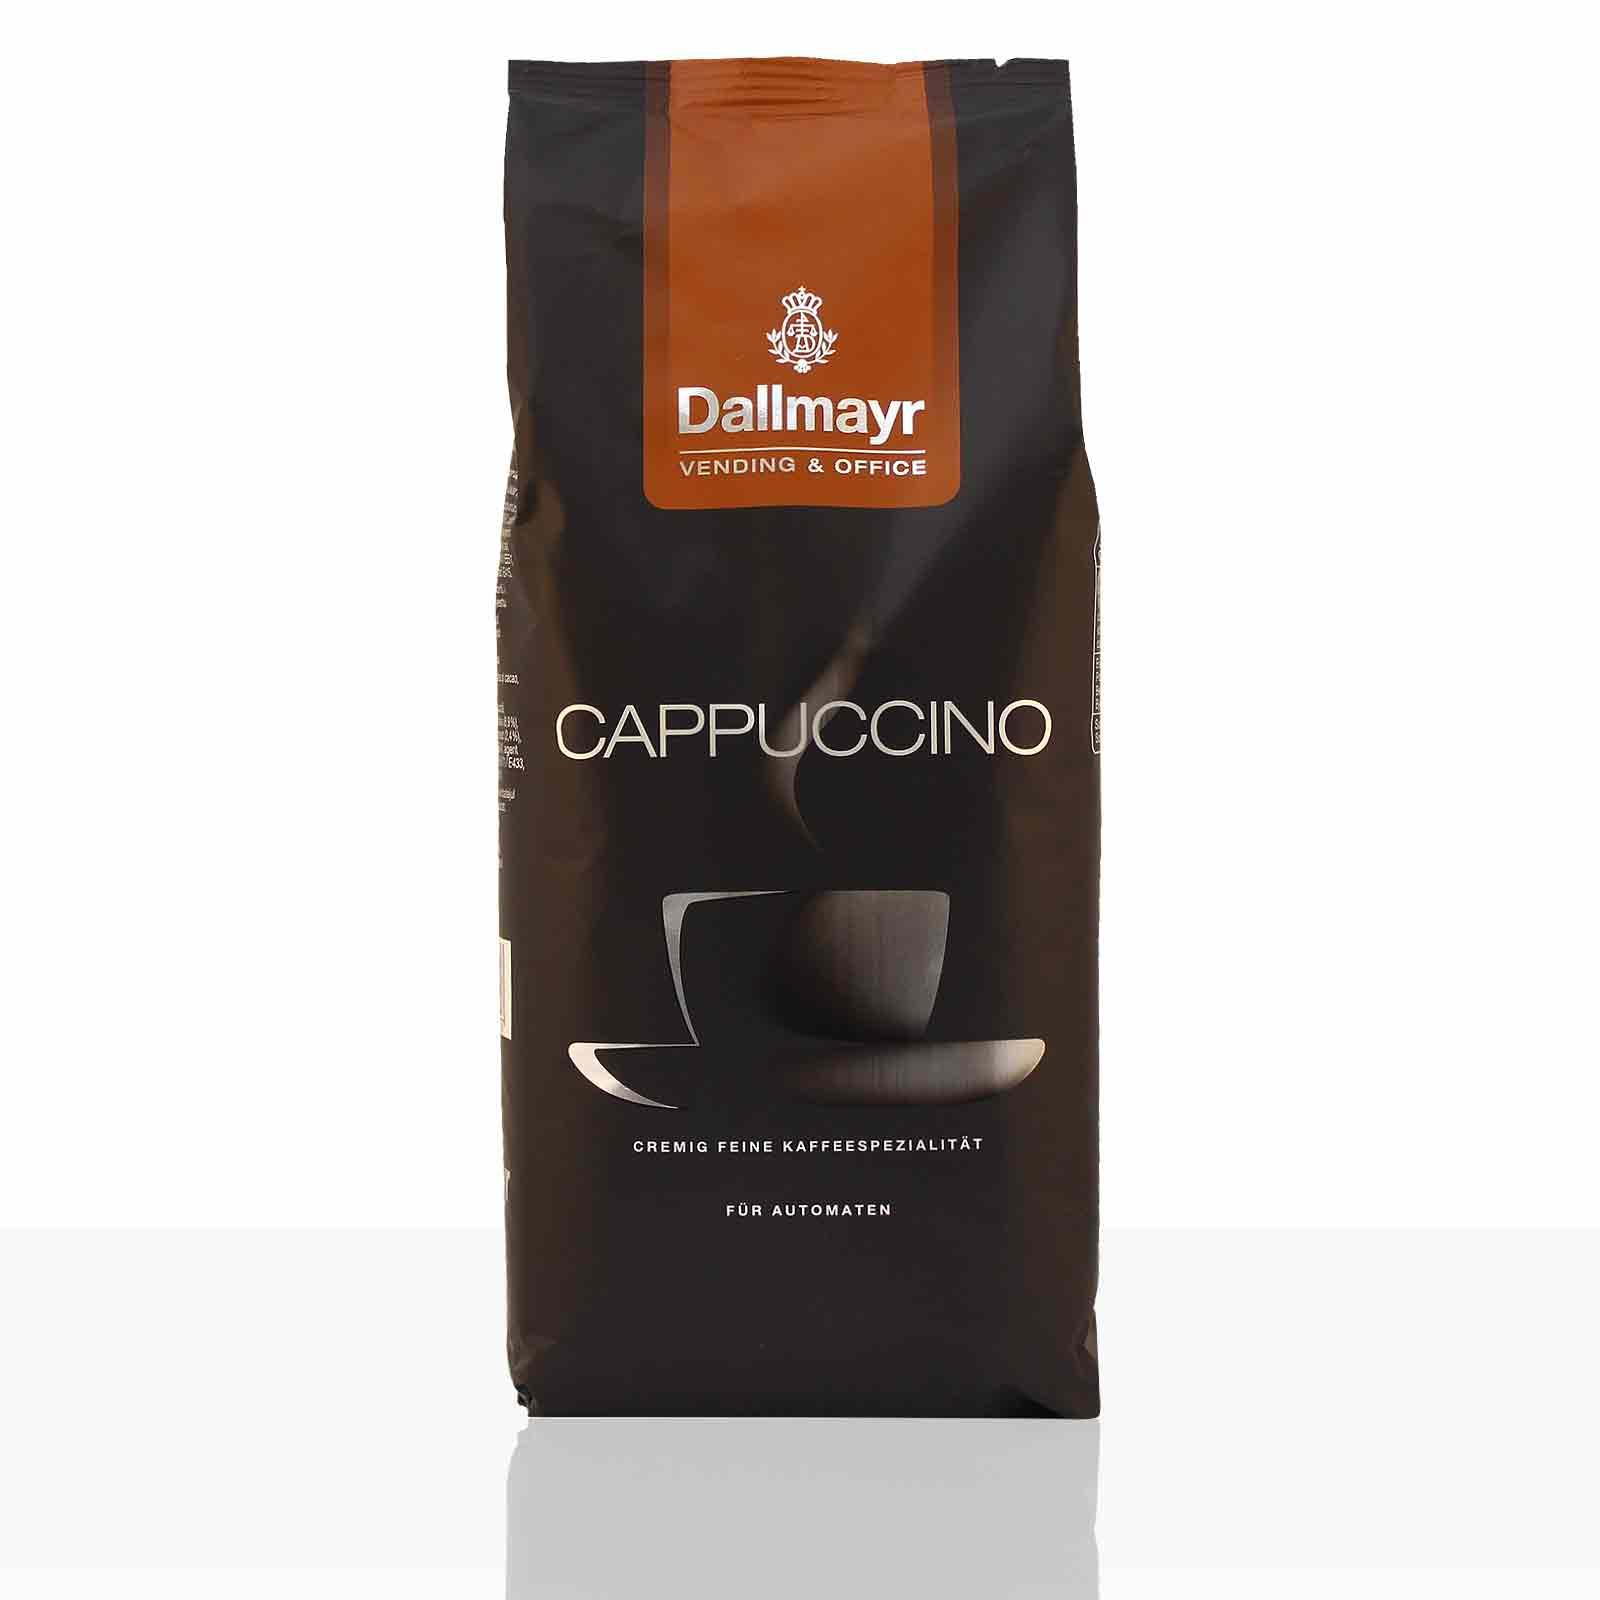 Dallmayr Cappuccino 10 x 1kg